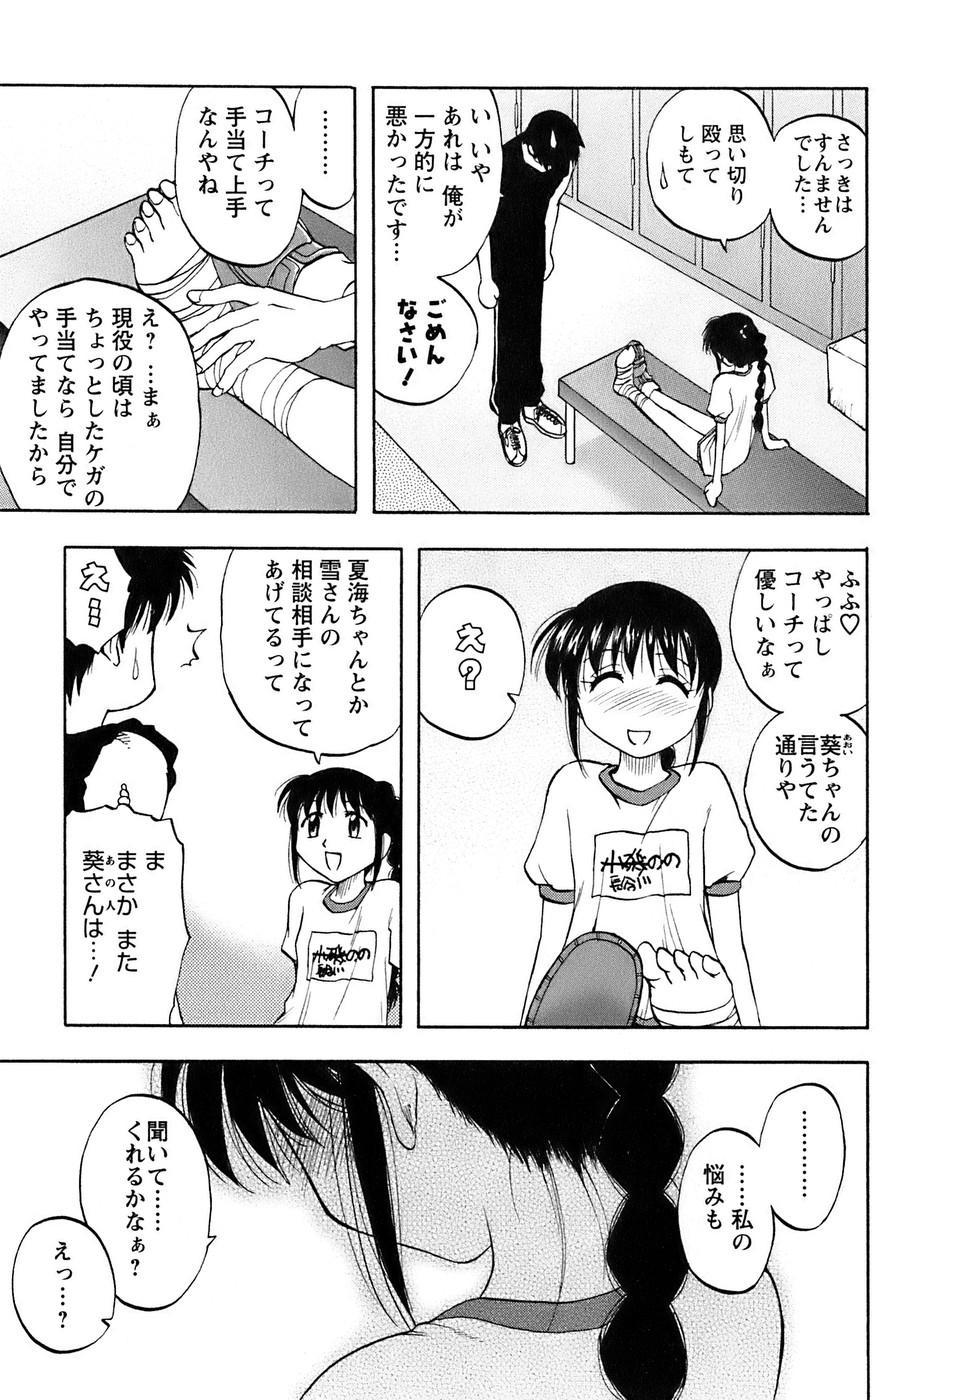 Okusan Volley - Madam Volleyball 89